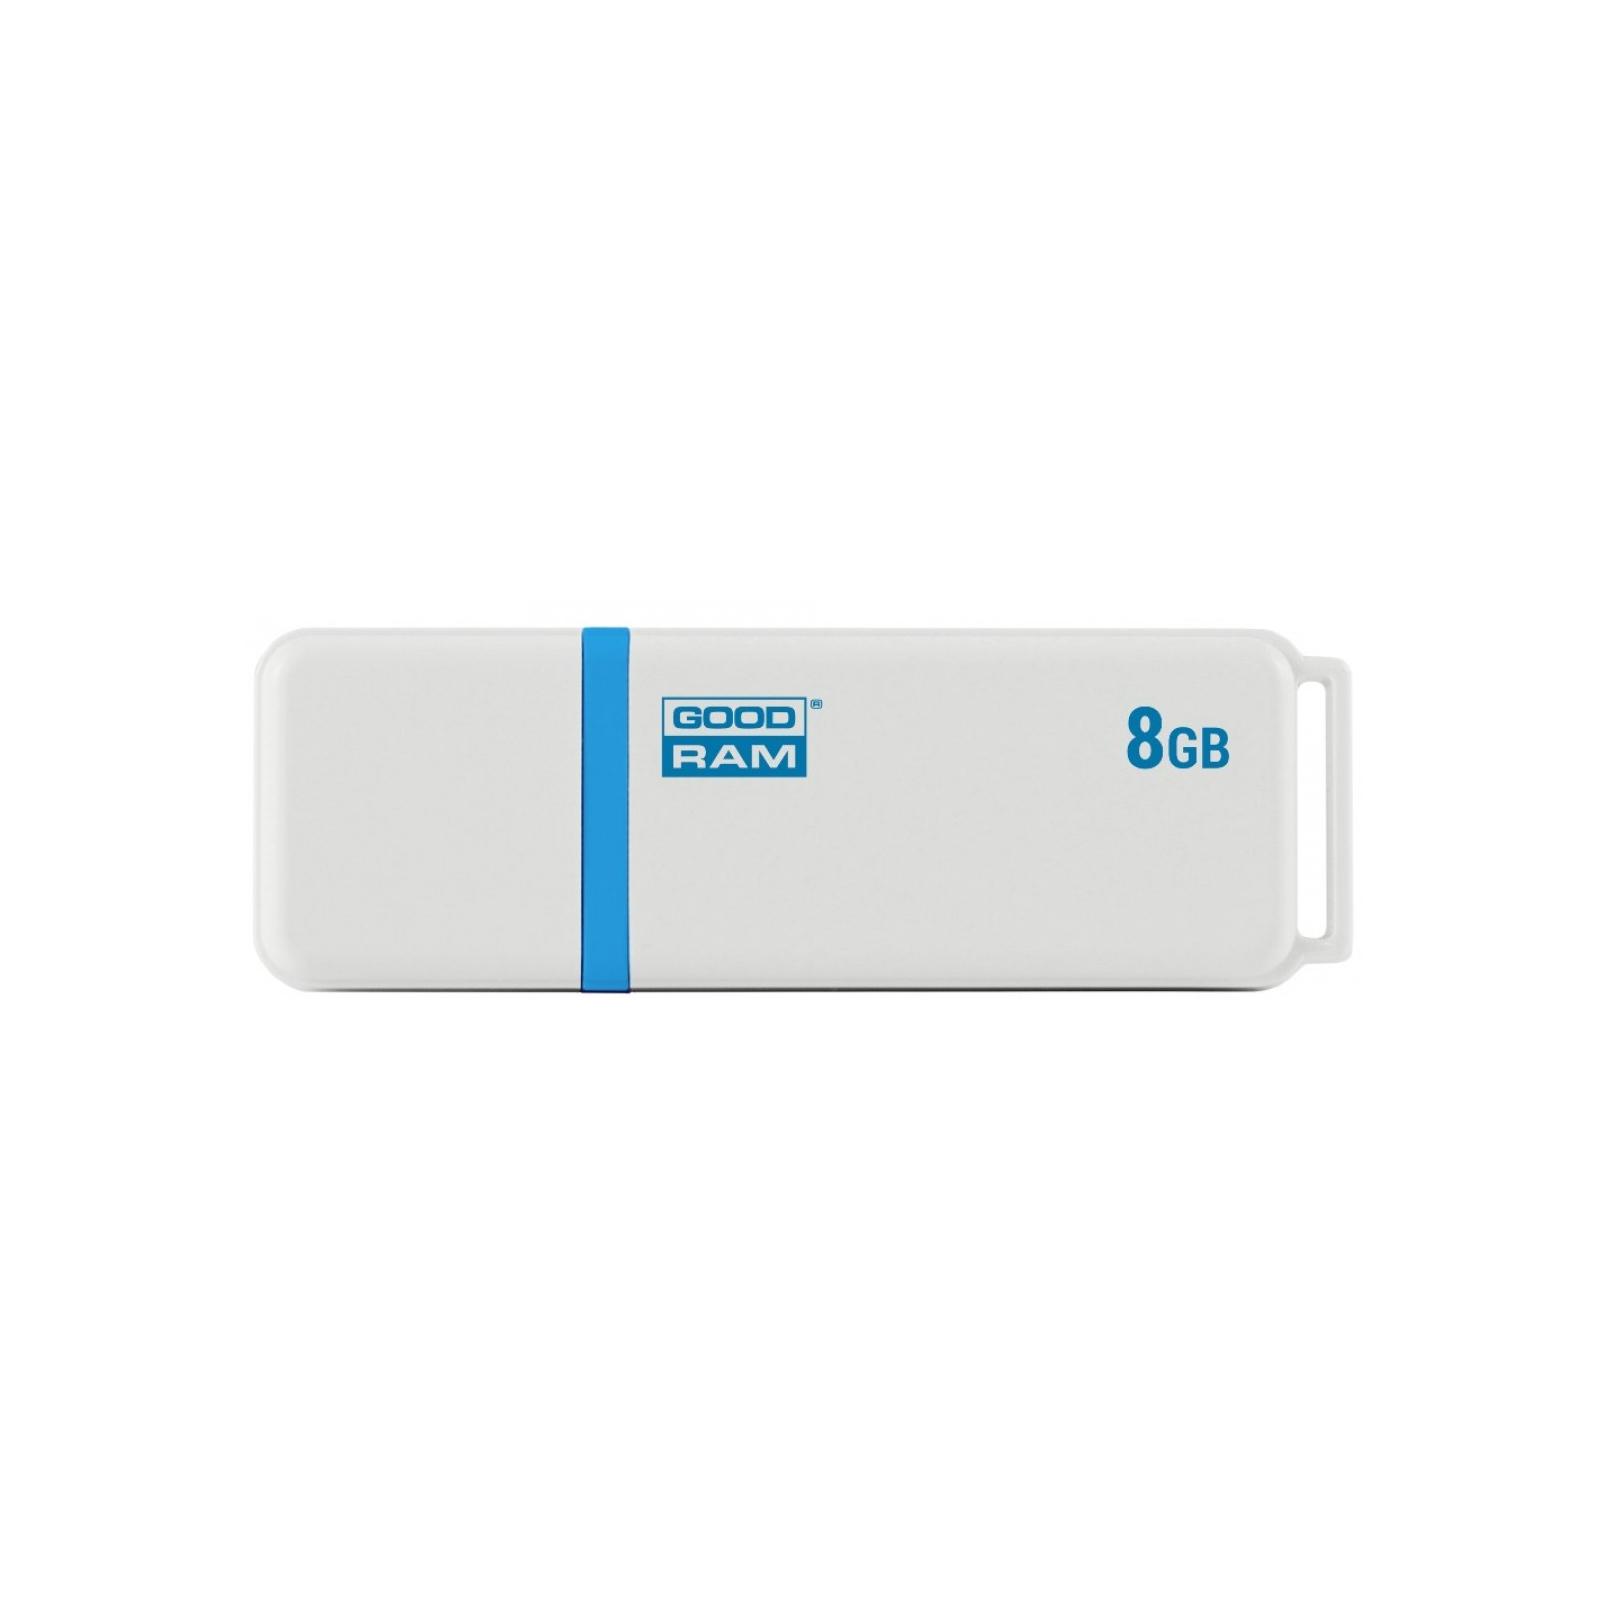 USB флеш накопитель Goodram 8GB UMO2 Green USB 2.0 (UMO2-0080G0R11)